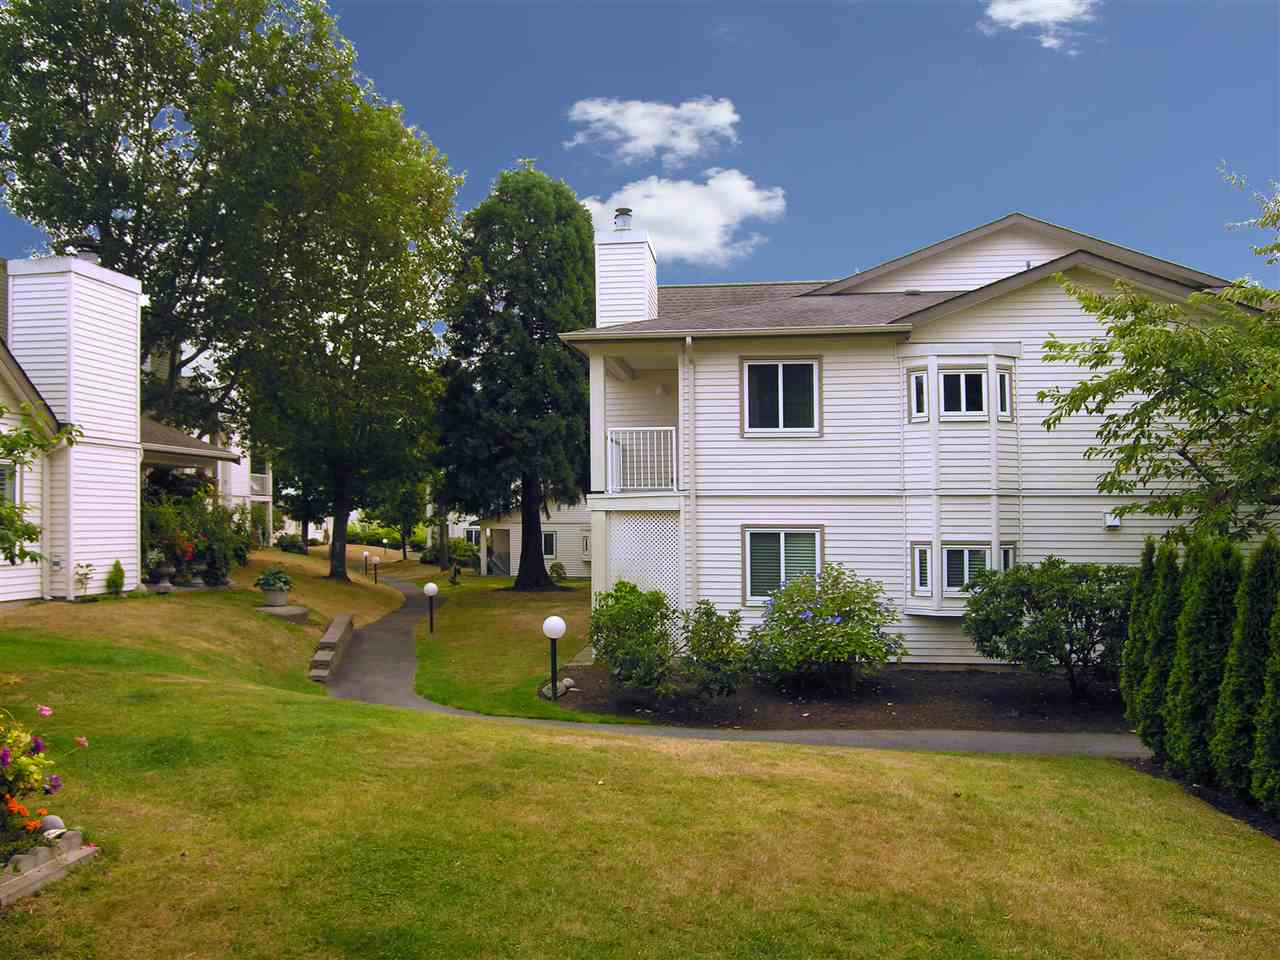 Townhouse at 4 12916 17 AVENUE, Unit 4, South Surrey White Rock, British Columbia. Image 1